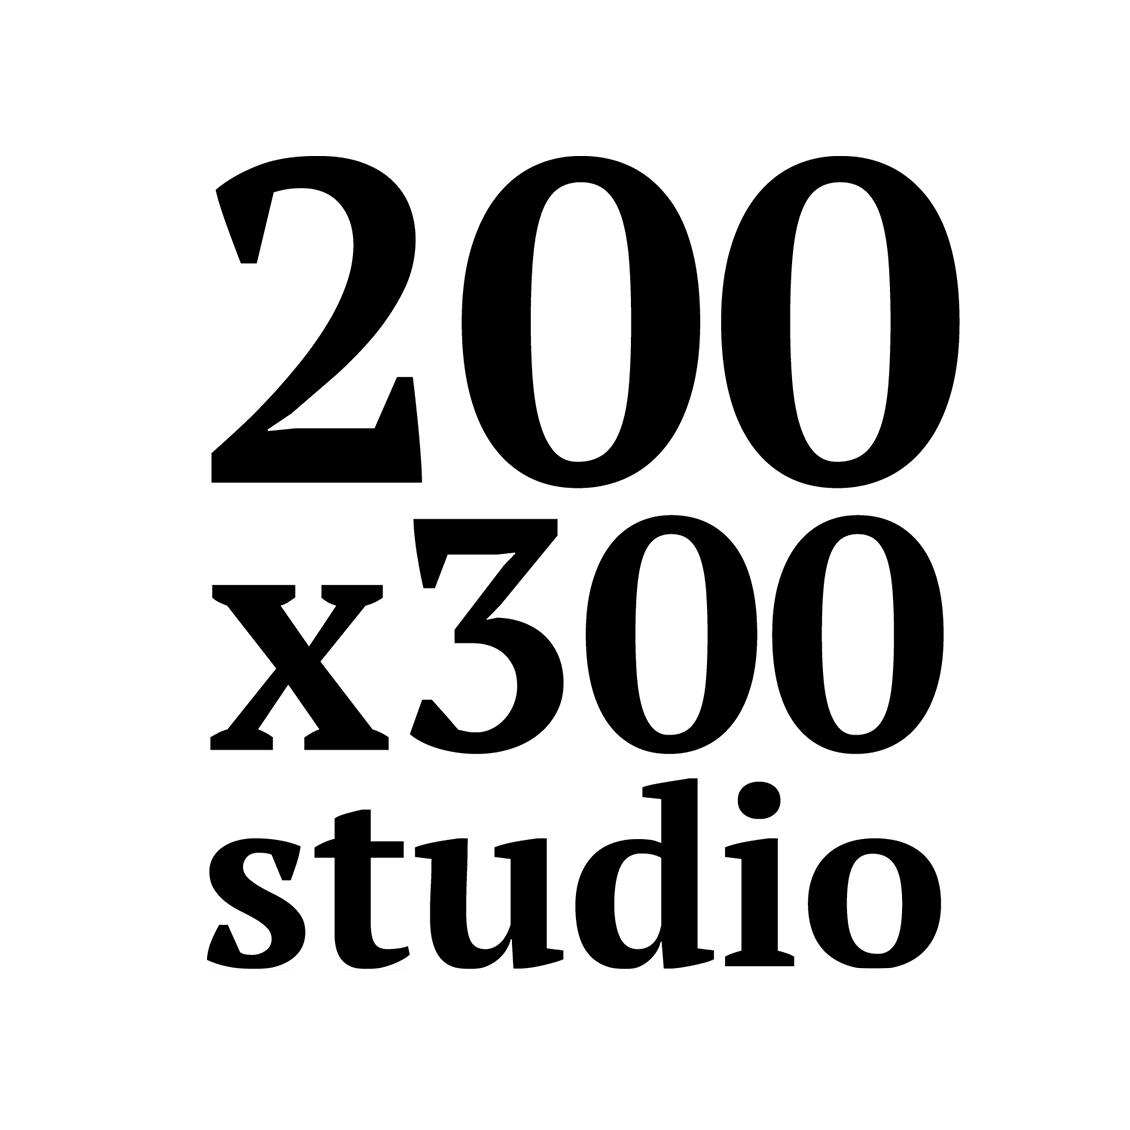 200x300 studio Logo